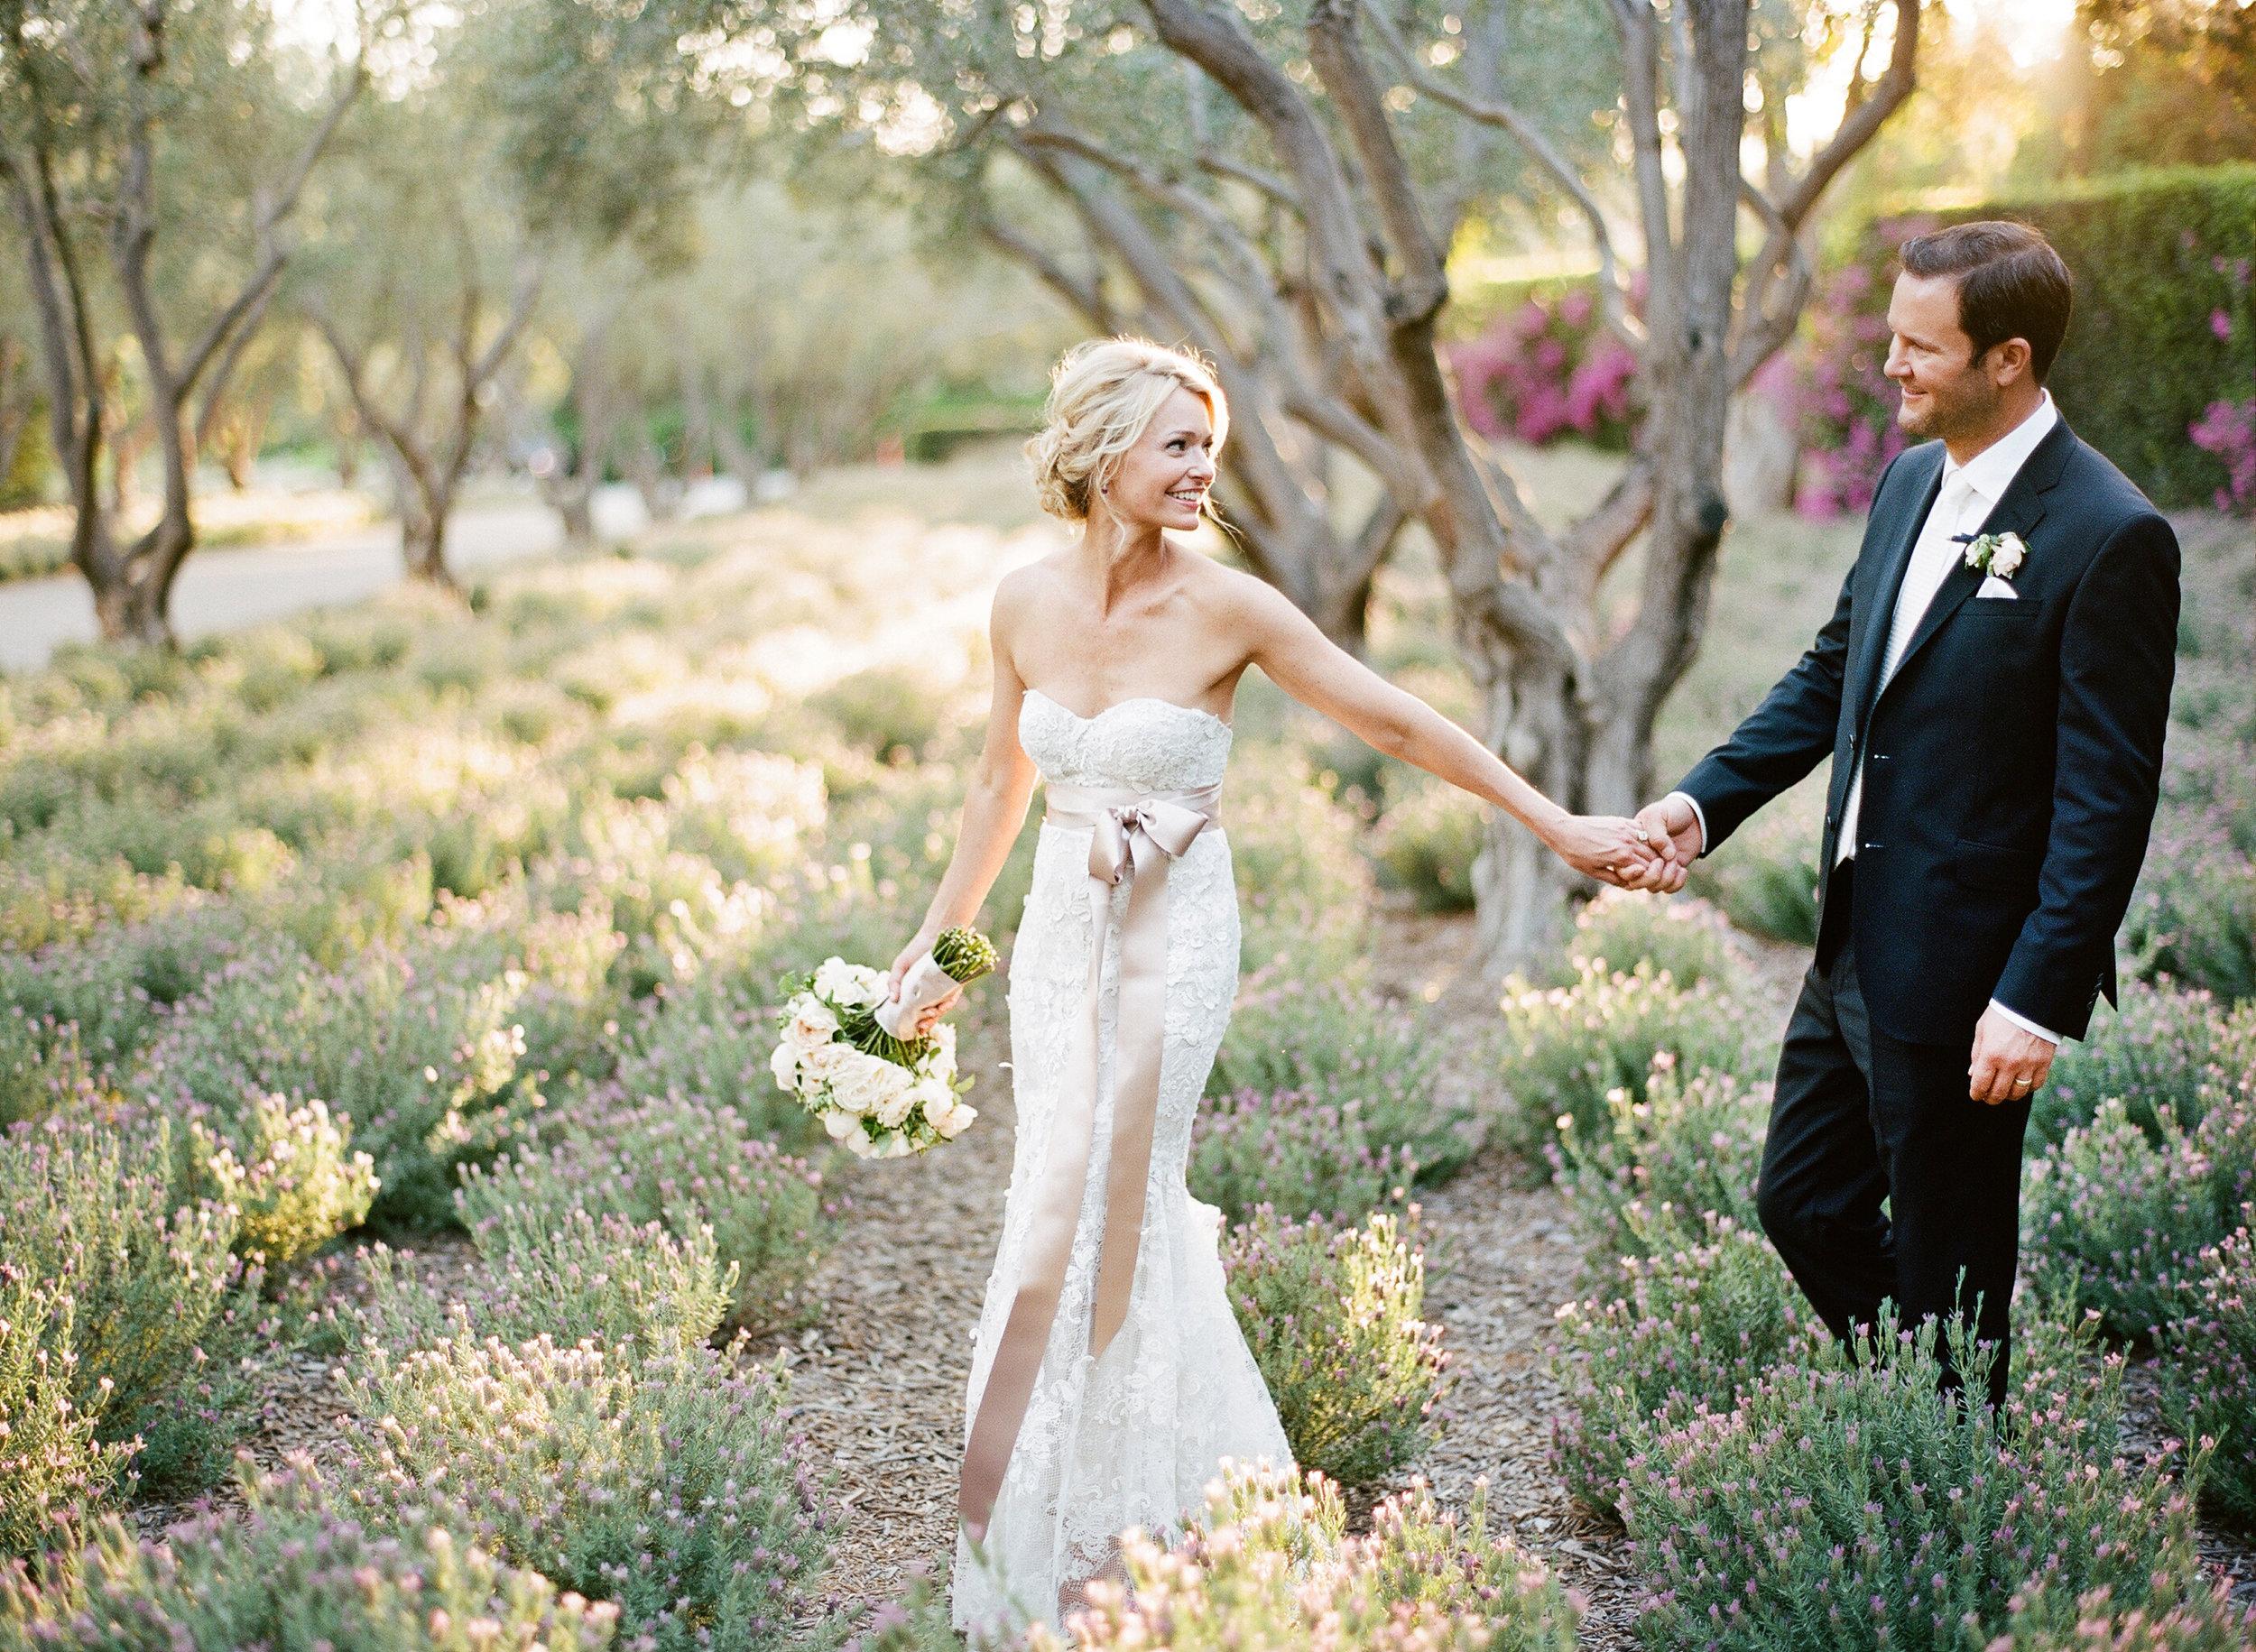 - KRISTEN BEINKE PHOTOGRAPHYWEB: www.kristenbeinke.comOWNER: Kristen BeinkeEMAIL: info@kristenbeinke.comINSTA: @kristenbeinkePHONE: 805.403.4742